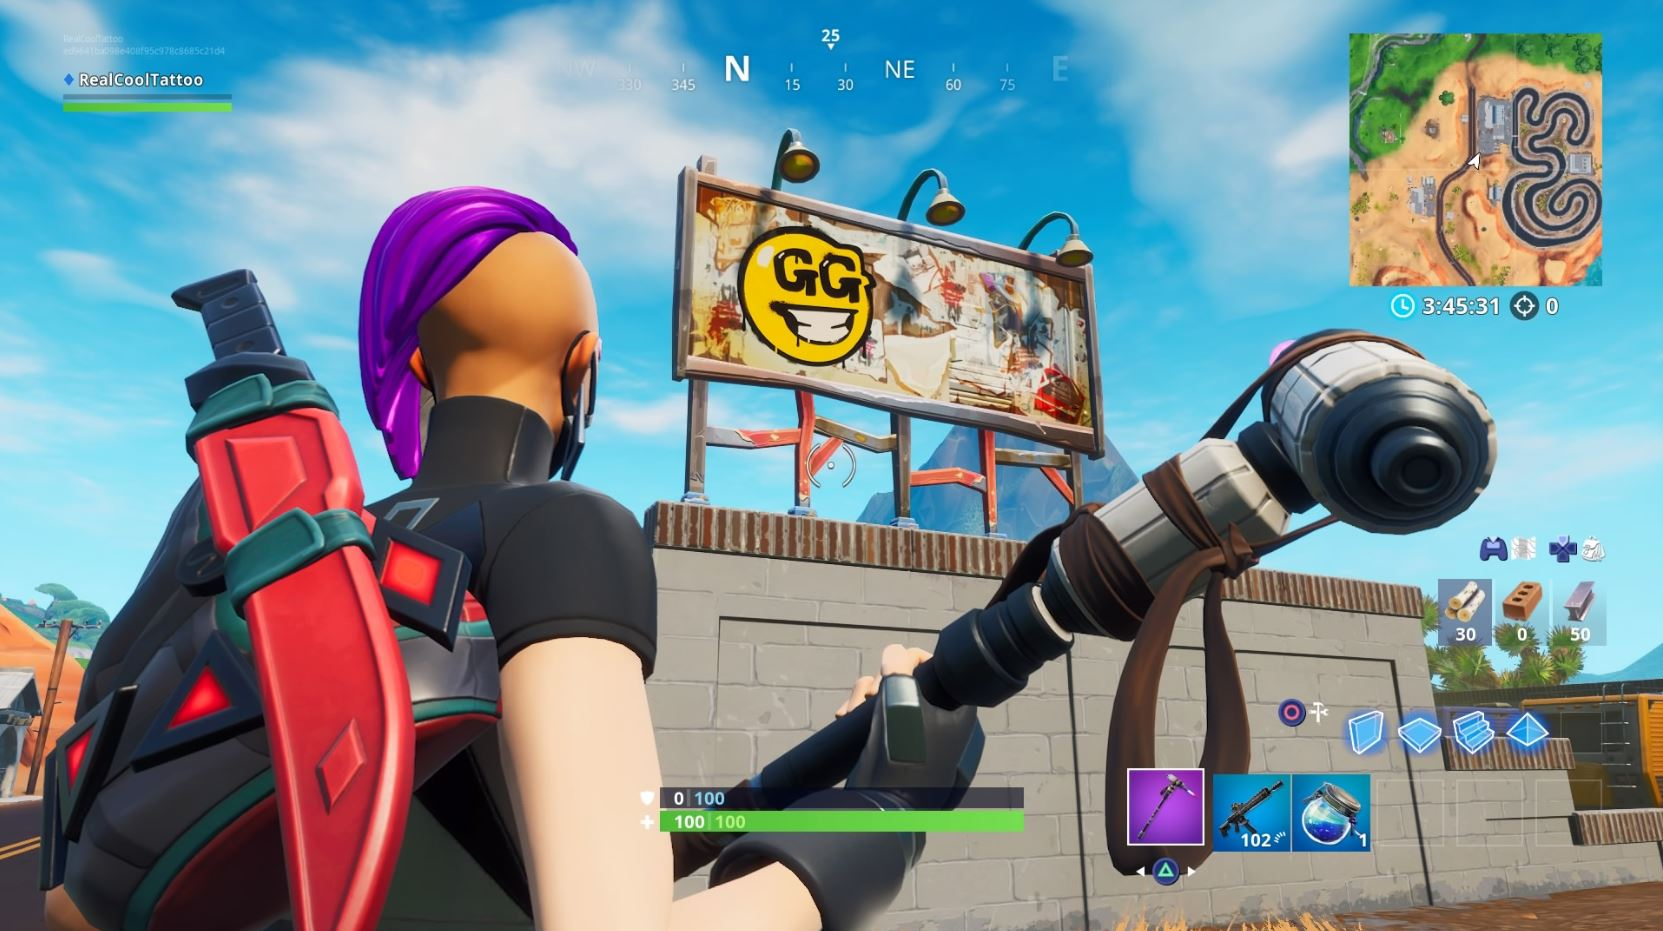 Fortnite: Visita la cartelera que dice Graffiti en un juego 3